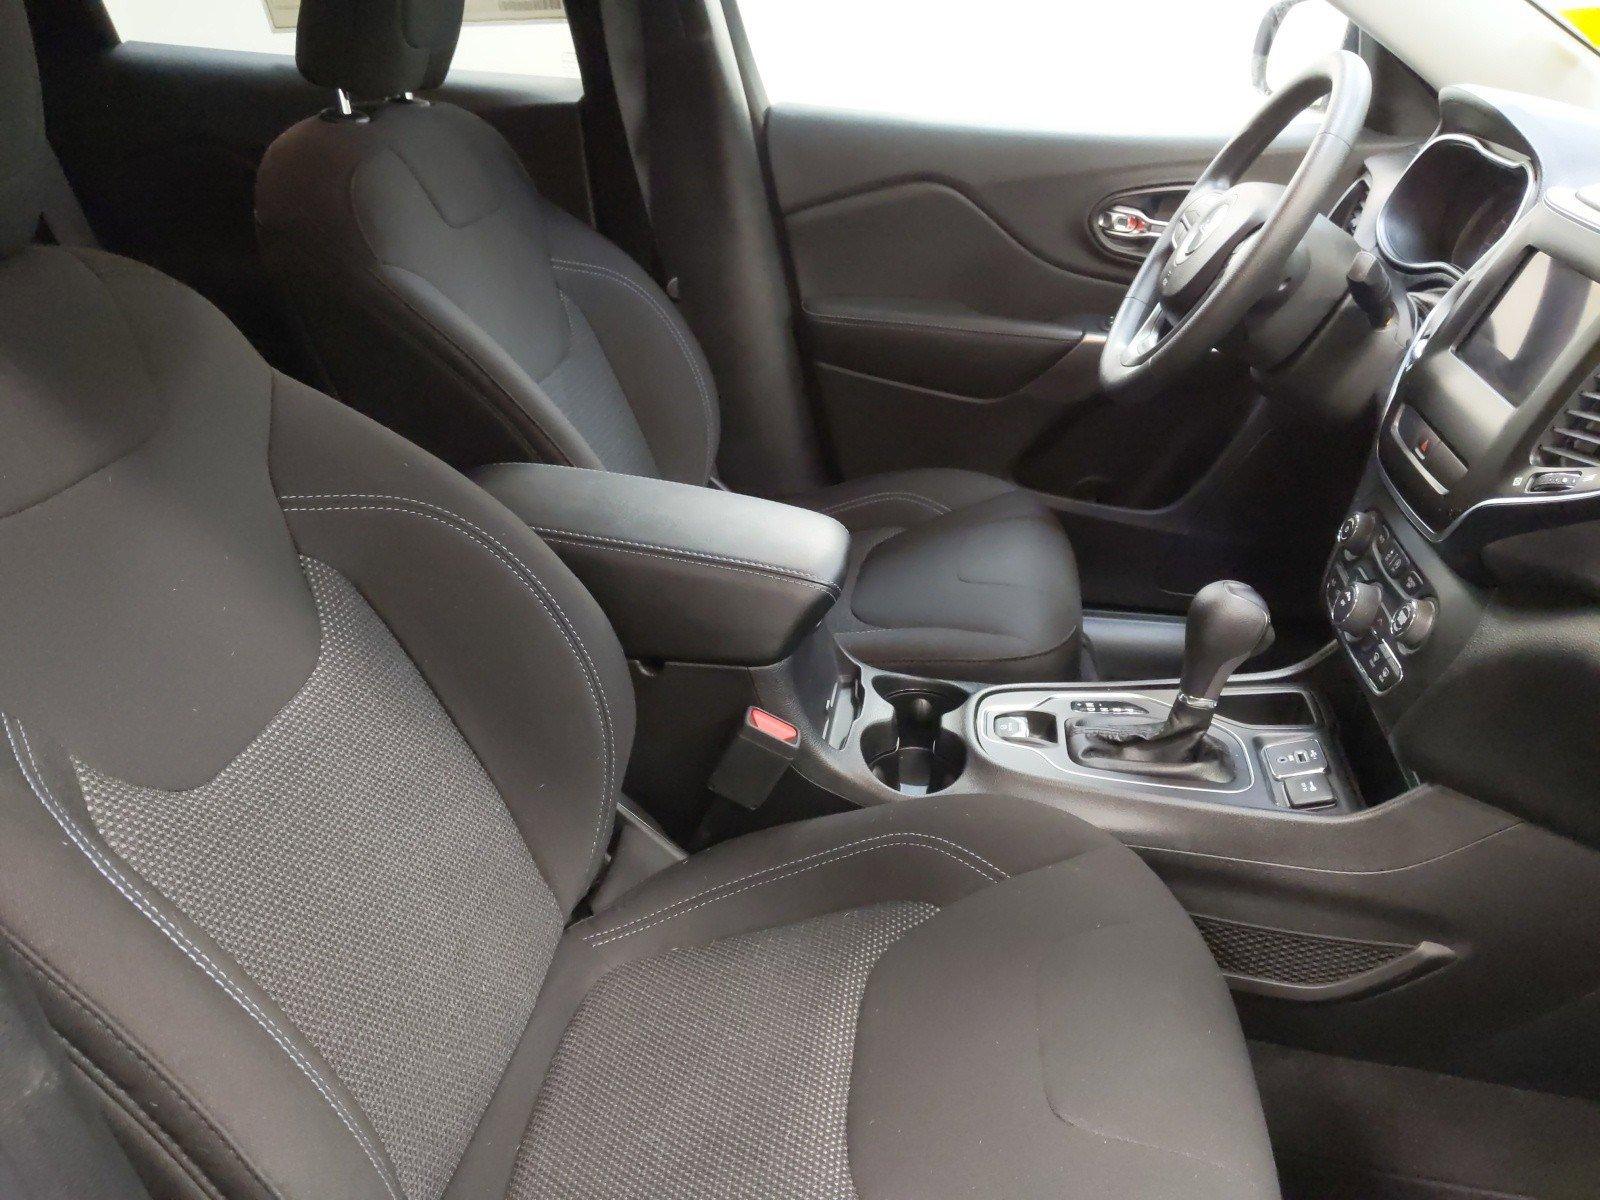 New 2019 Jeep Cherokee Latitude Sport Utility for sale in Grand Island NE